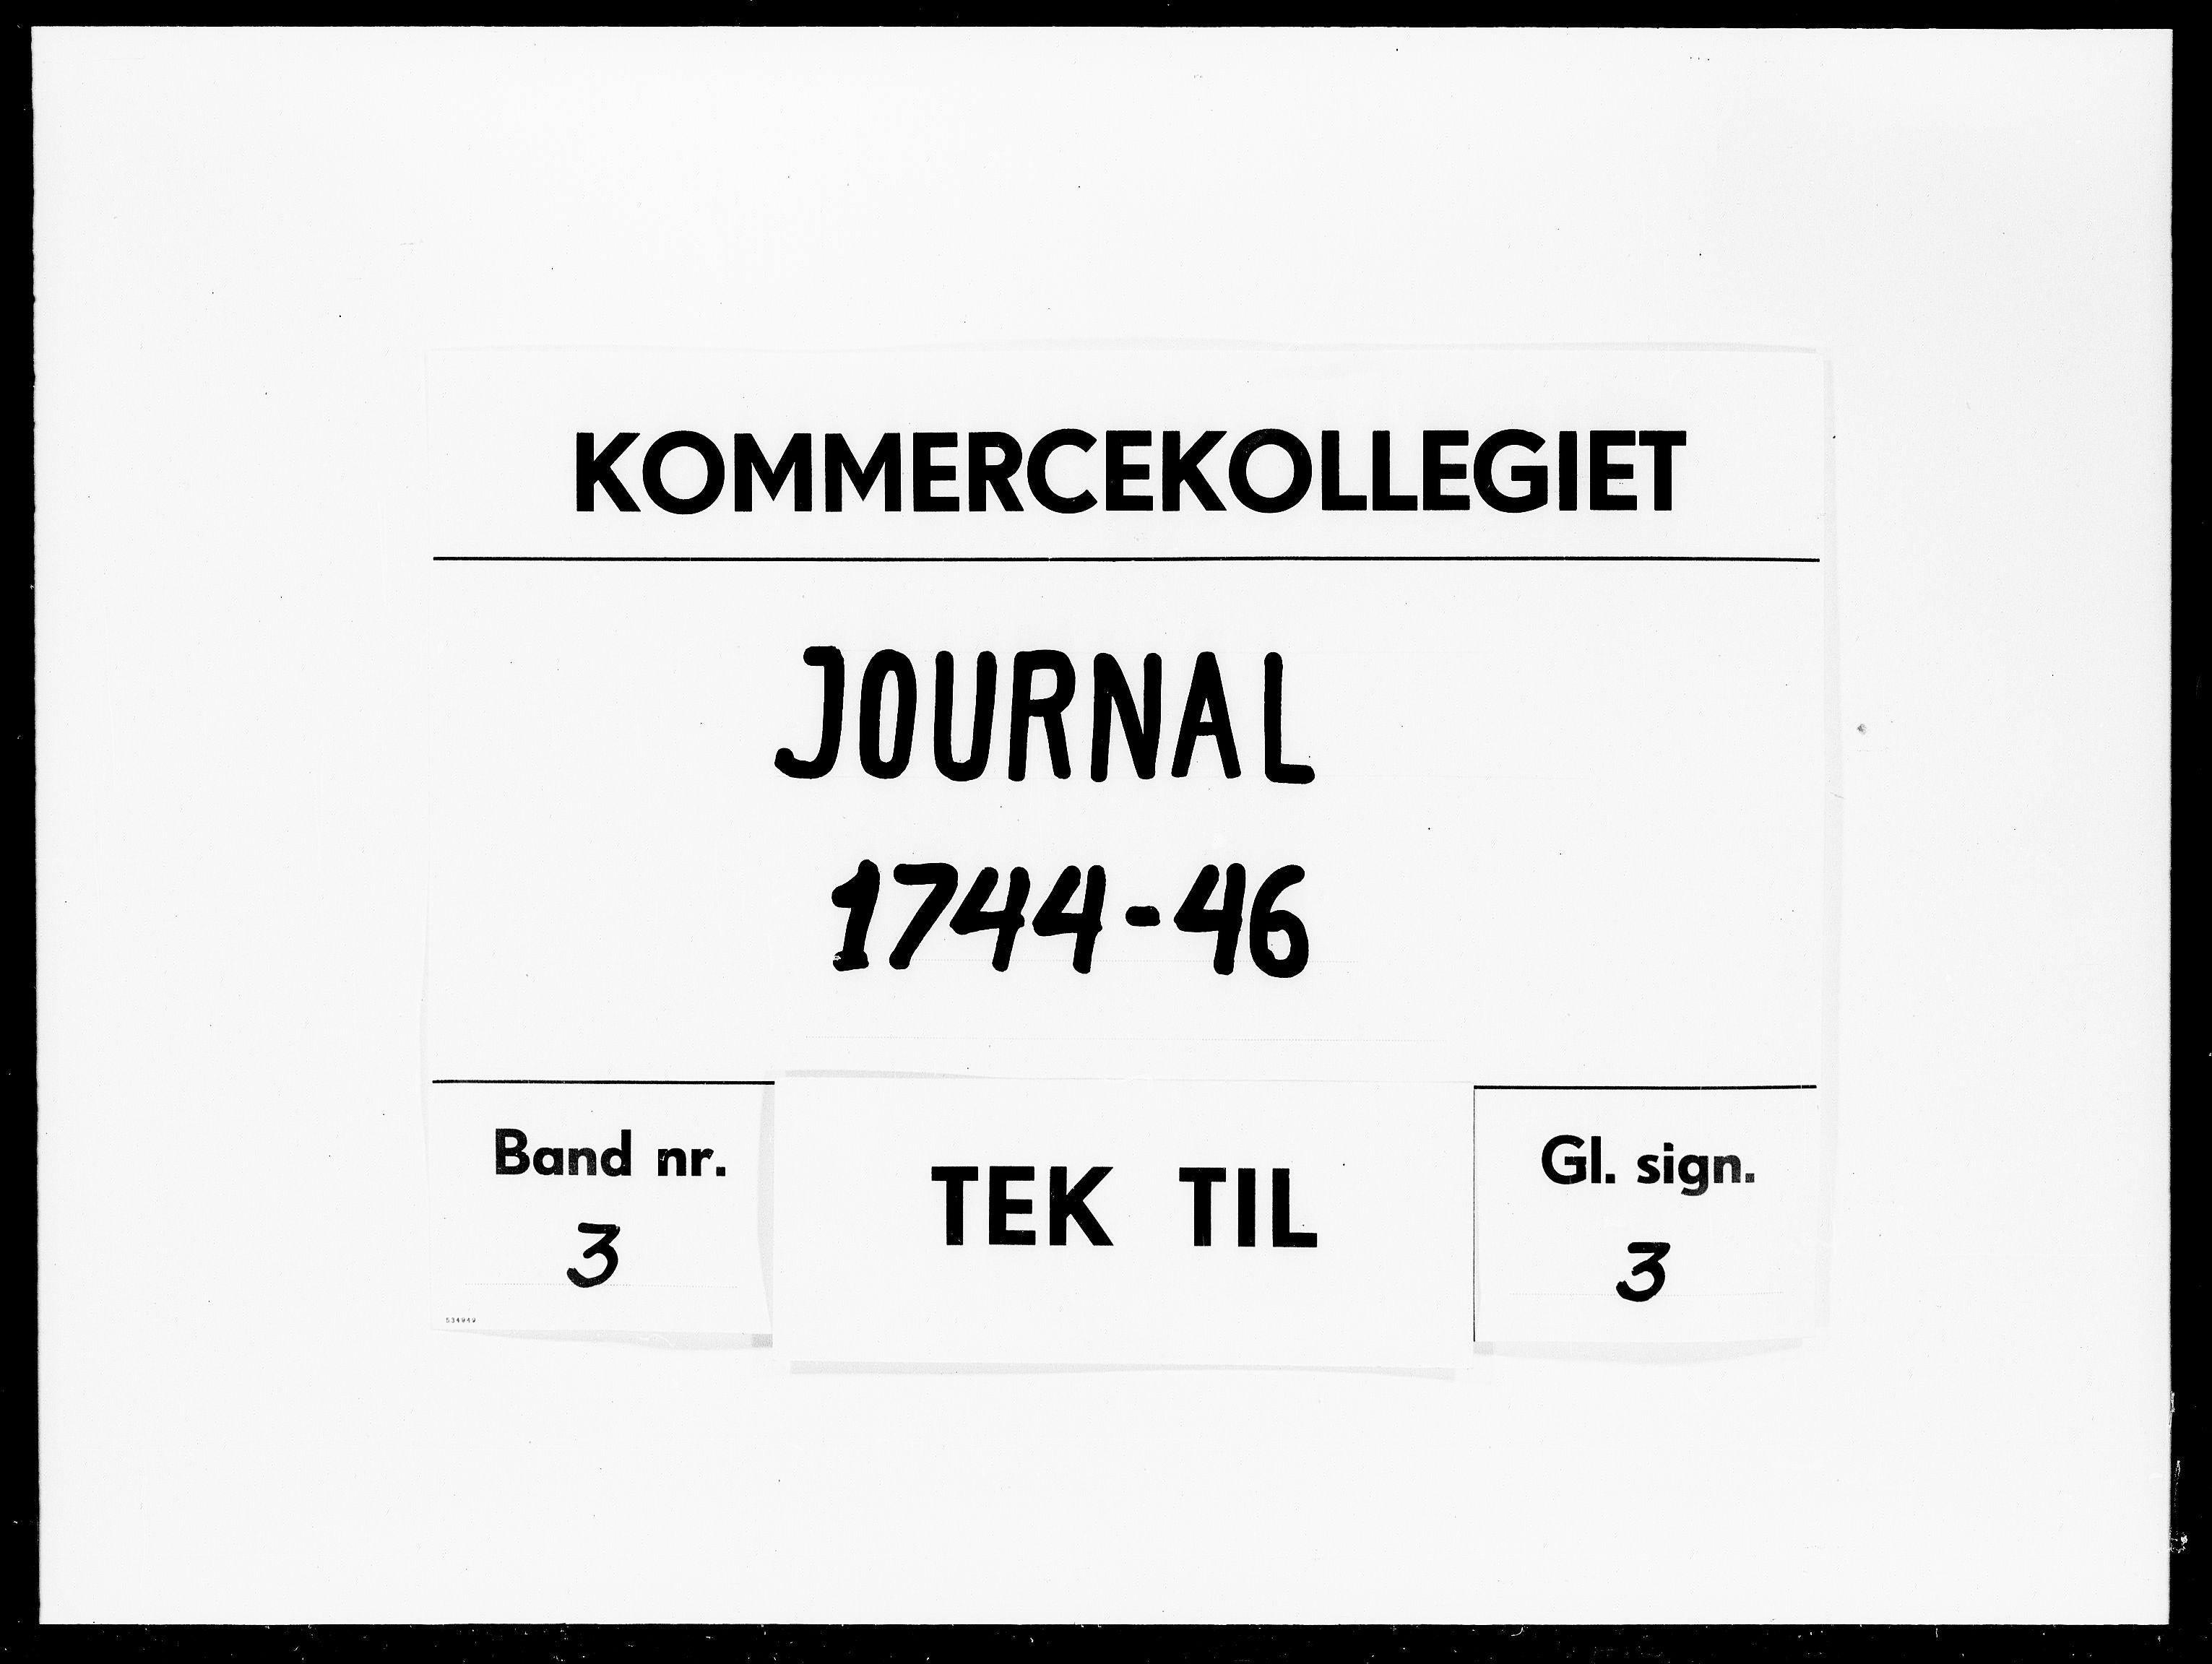 DRA, Kommercekollegiet, Dansk-Norske Sekretariat, -/51: Journal nr. 3, 1744-1746